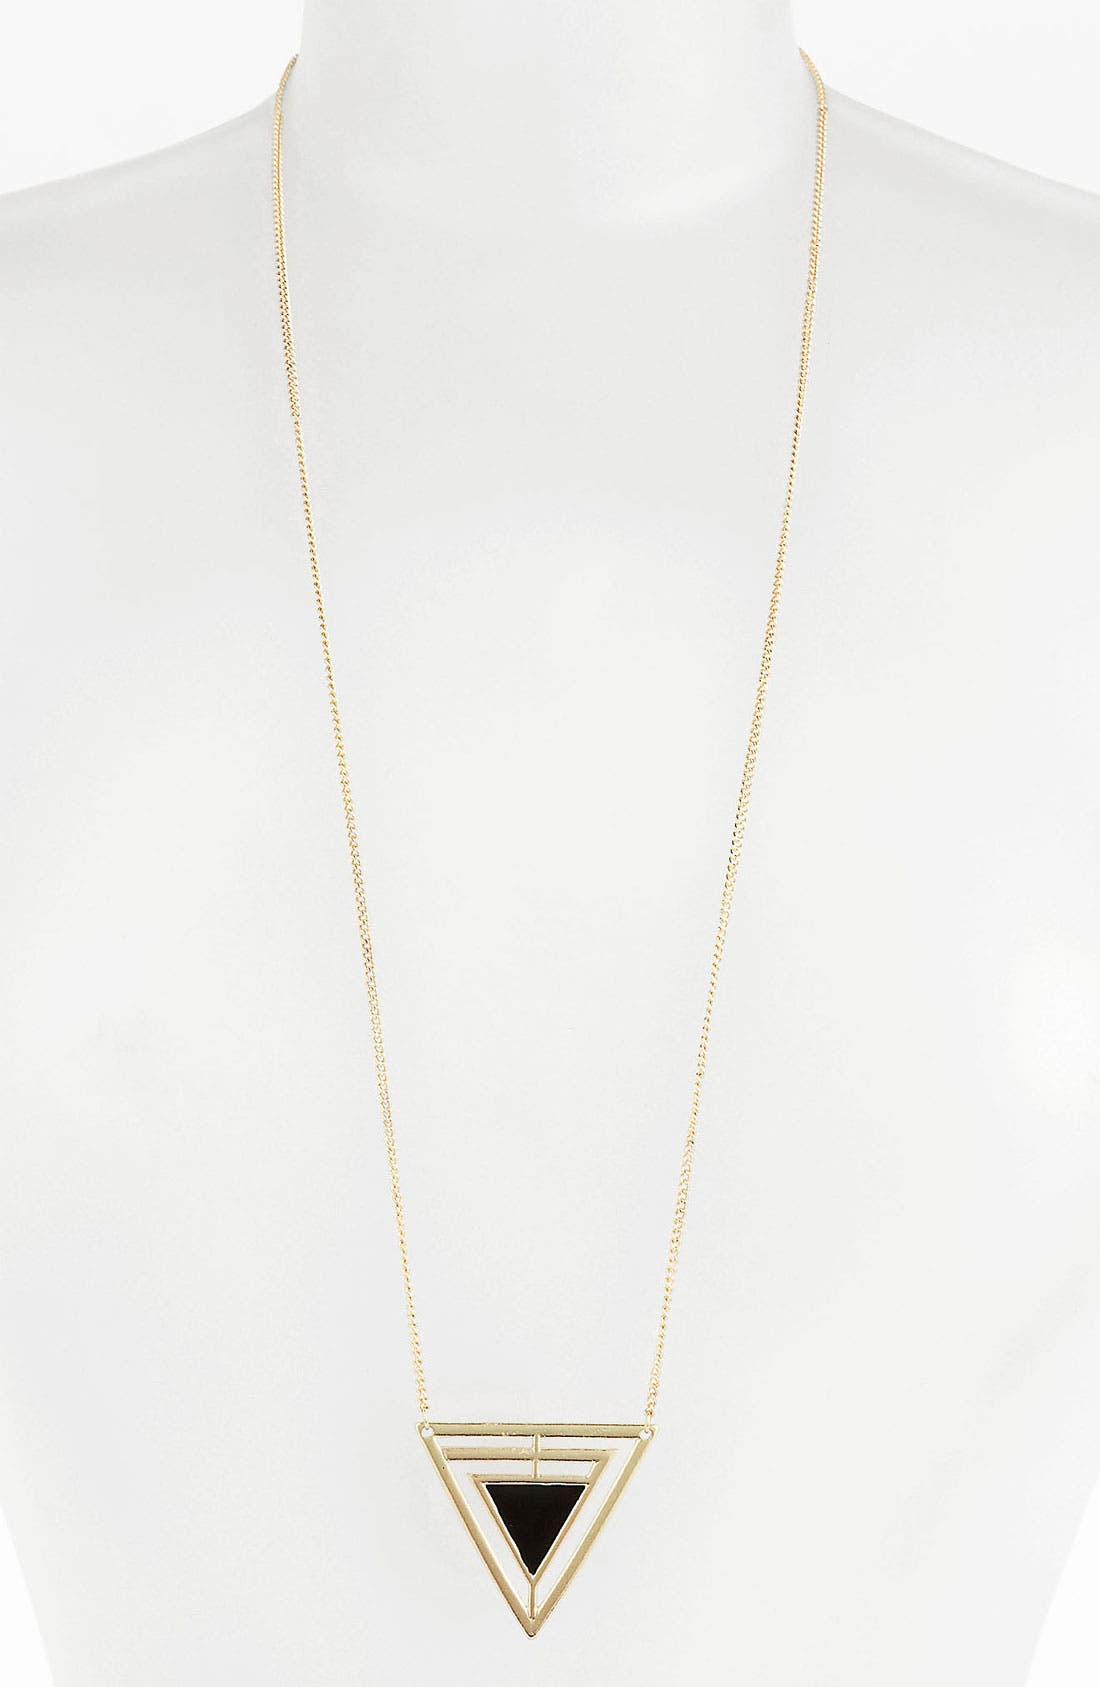 Alternate Image 1 Selected - Orion Art Deco Pendant Necklace